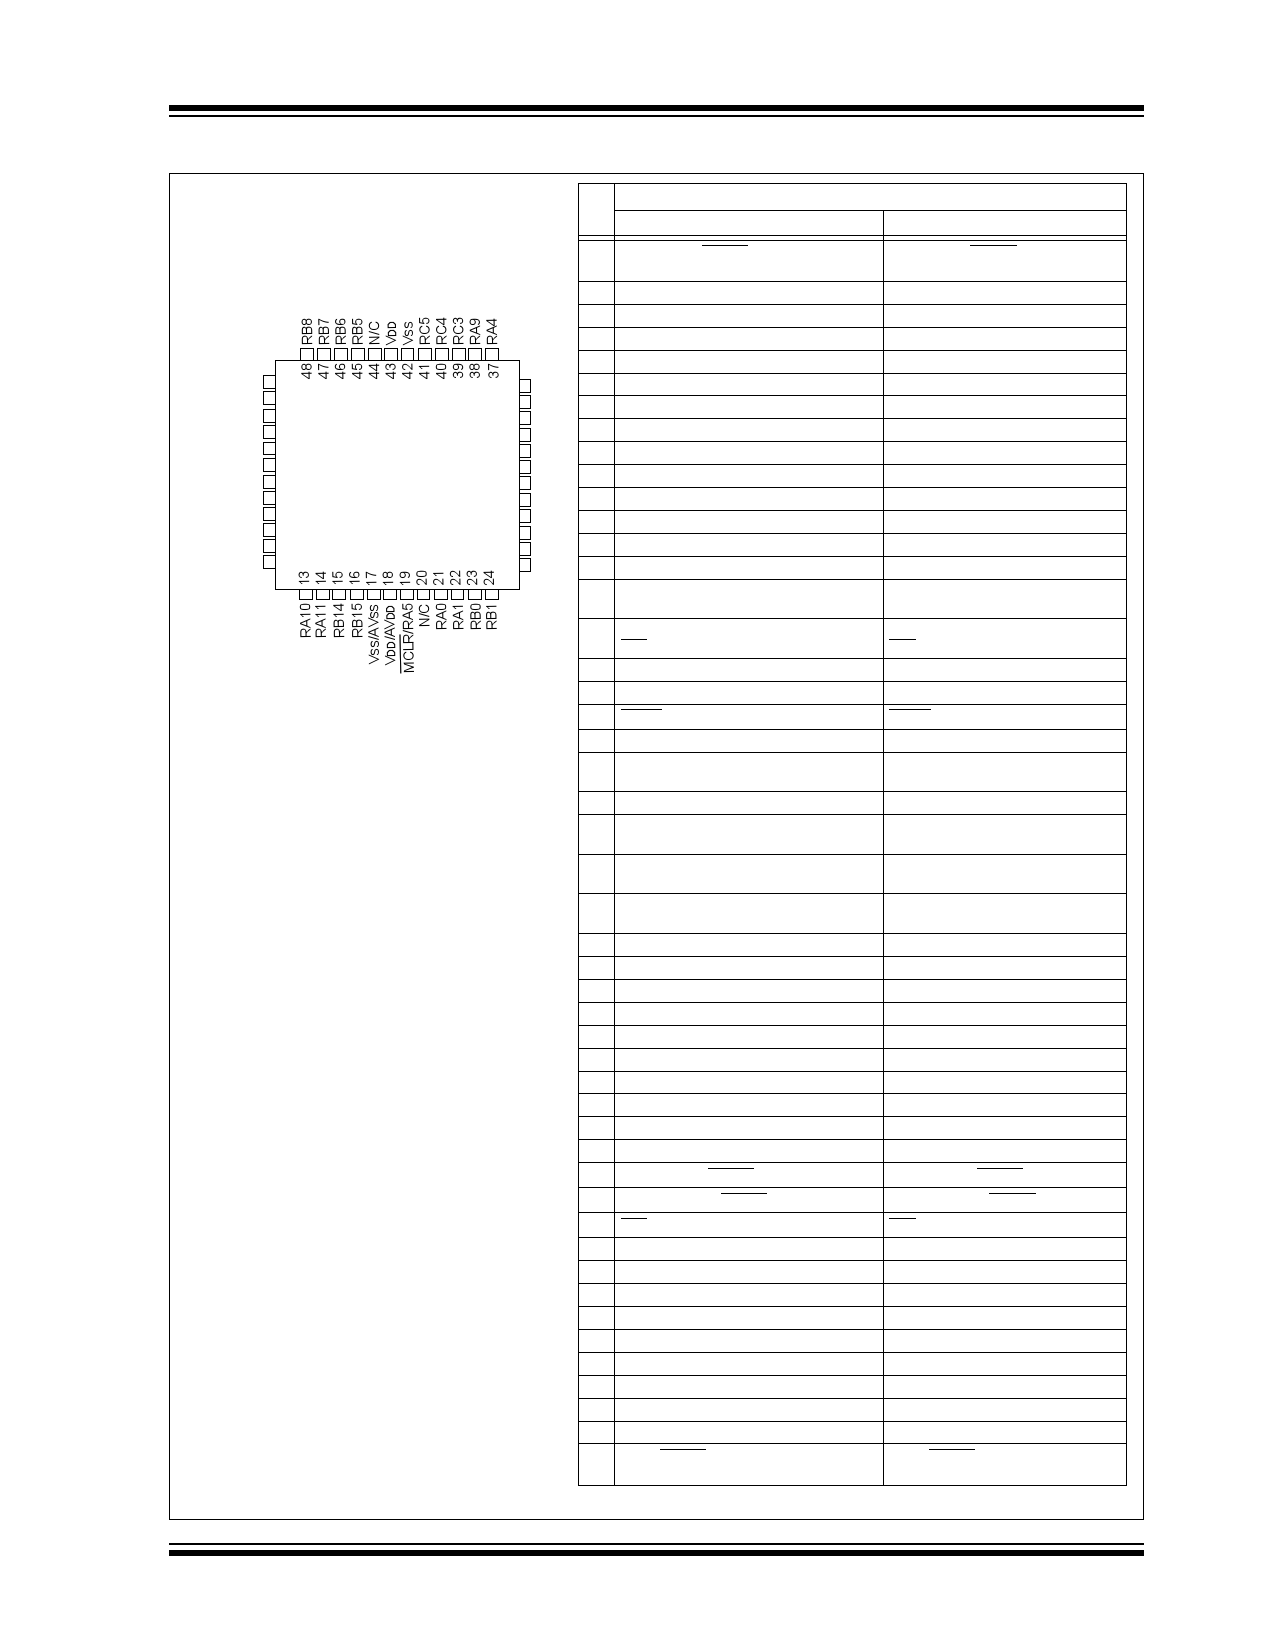 PIC24F32KA302 전자부품, 판매, 대치품